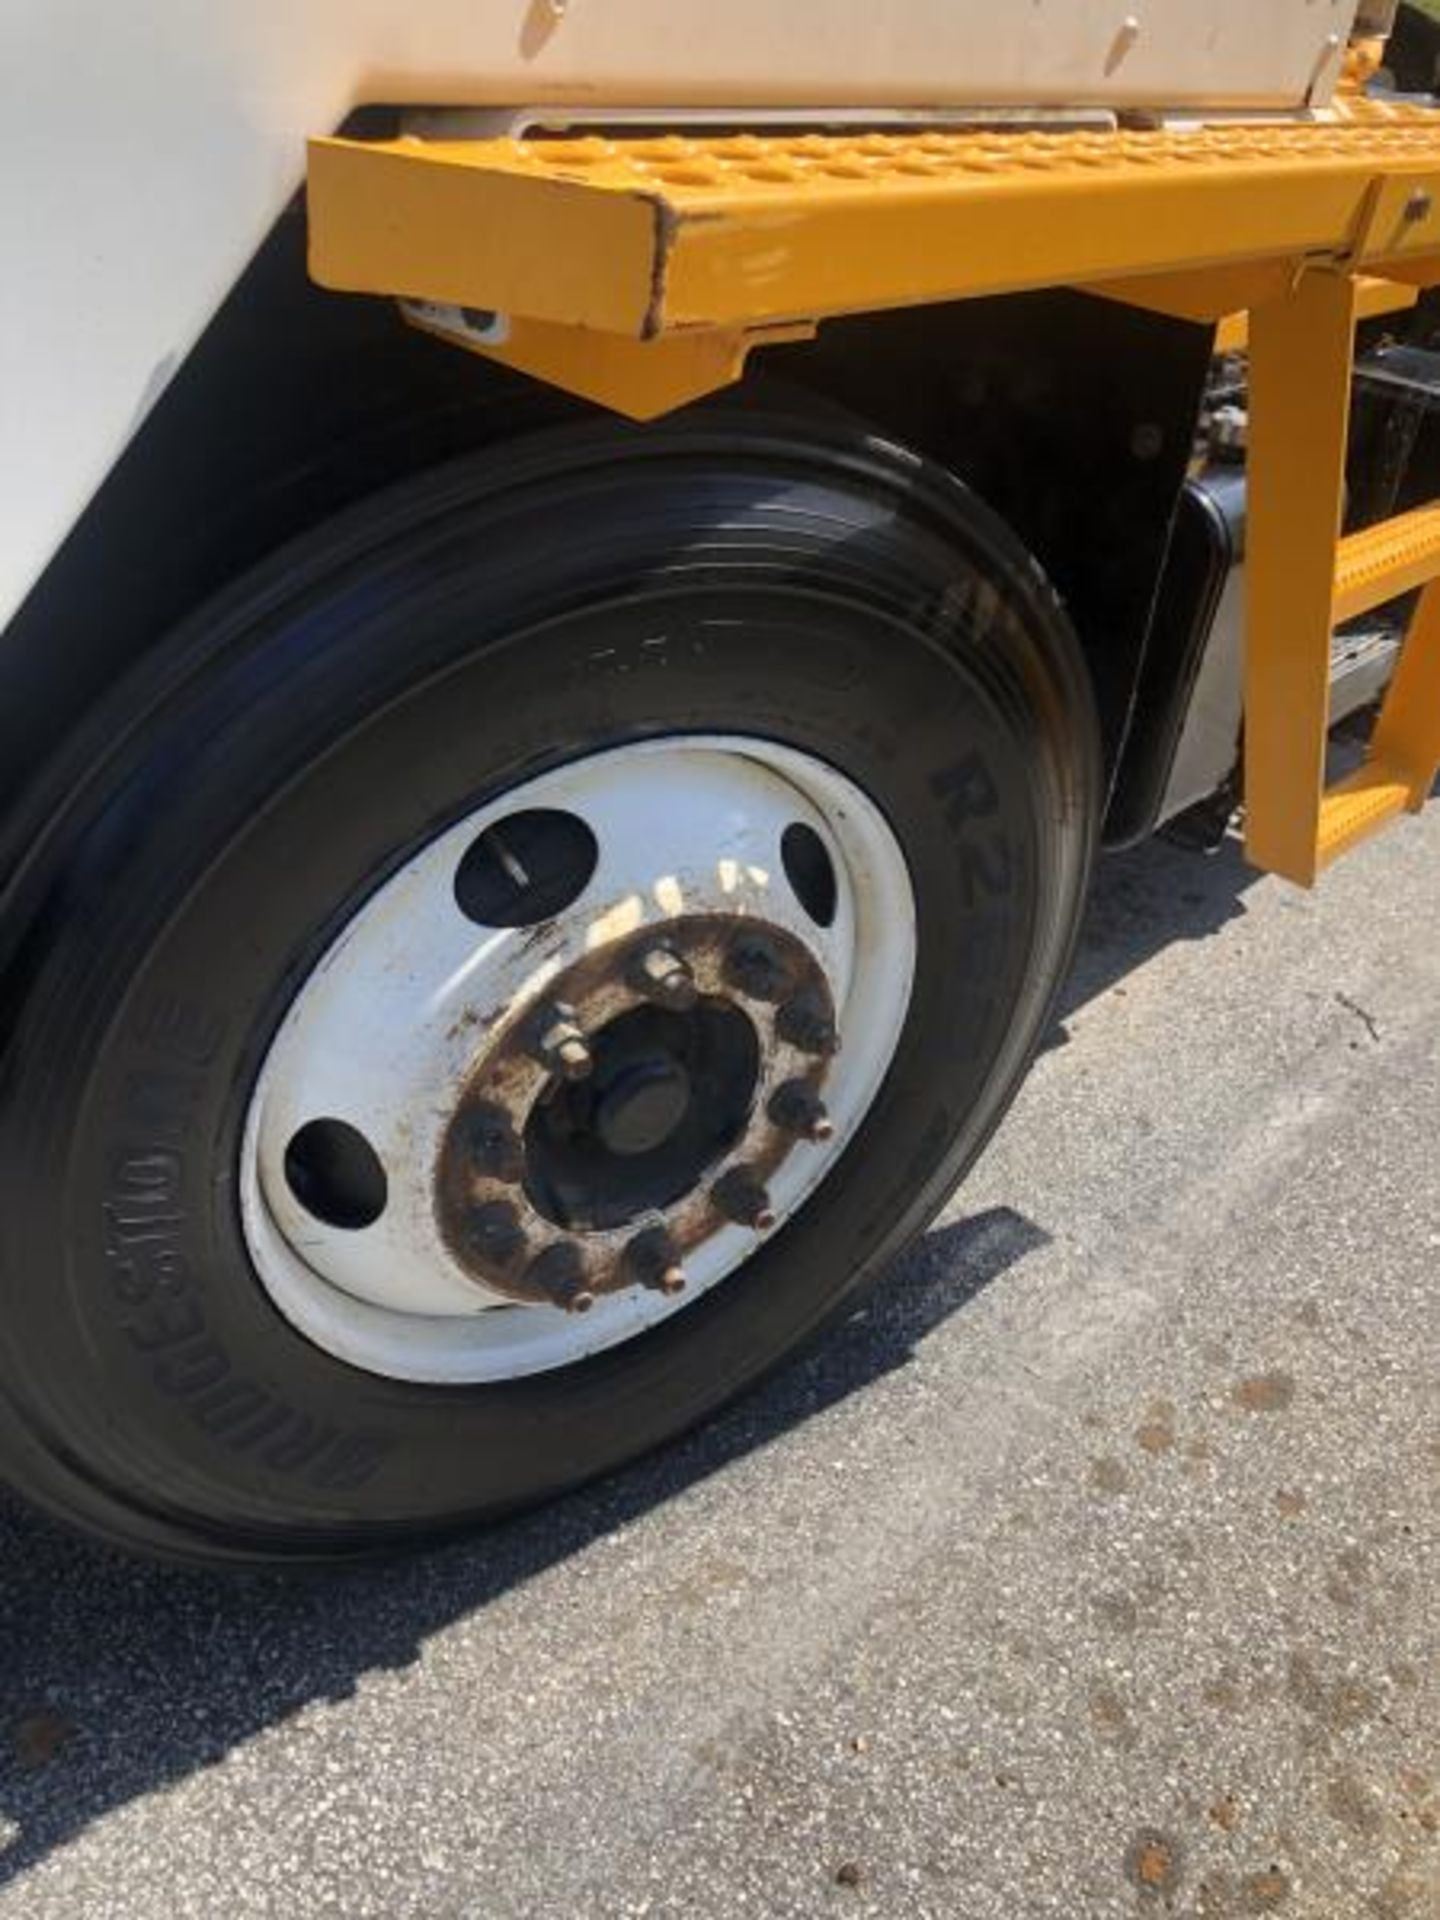 2015 Kalmar Ottawa 4x2 Yard Truck , SN: 338836 1,939.0 Hours, 1,961 Miles - Image 4 of 33